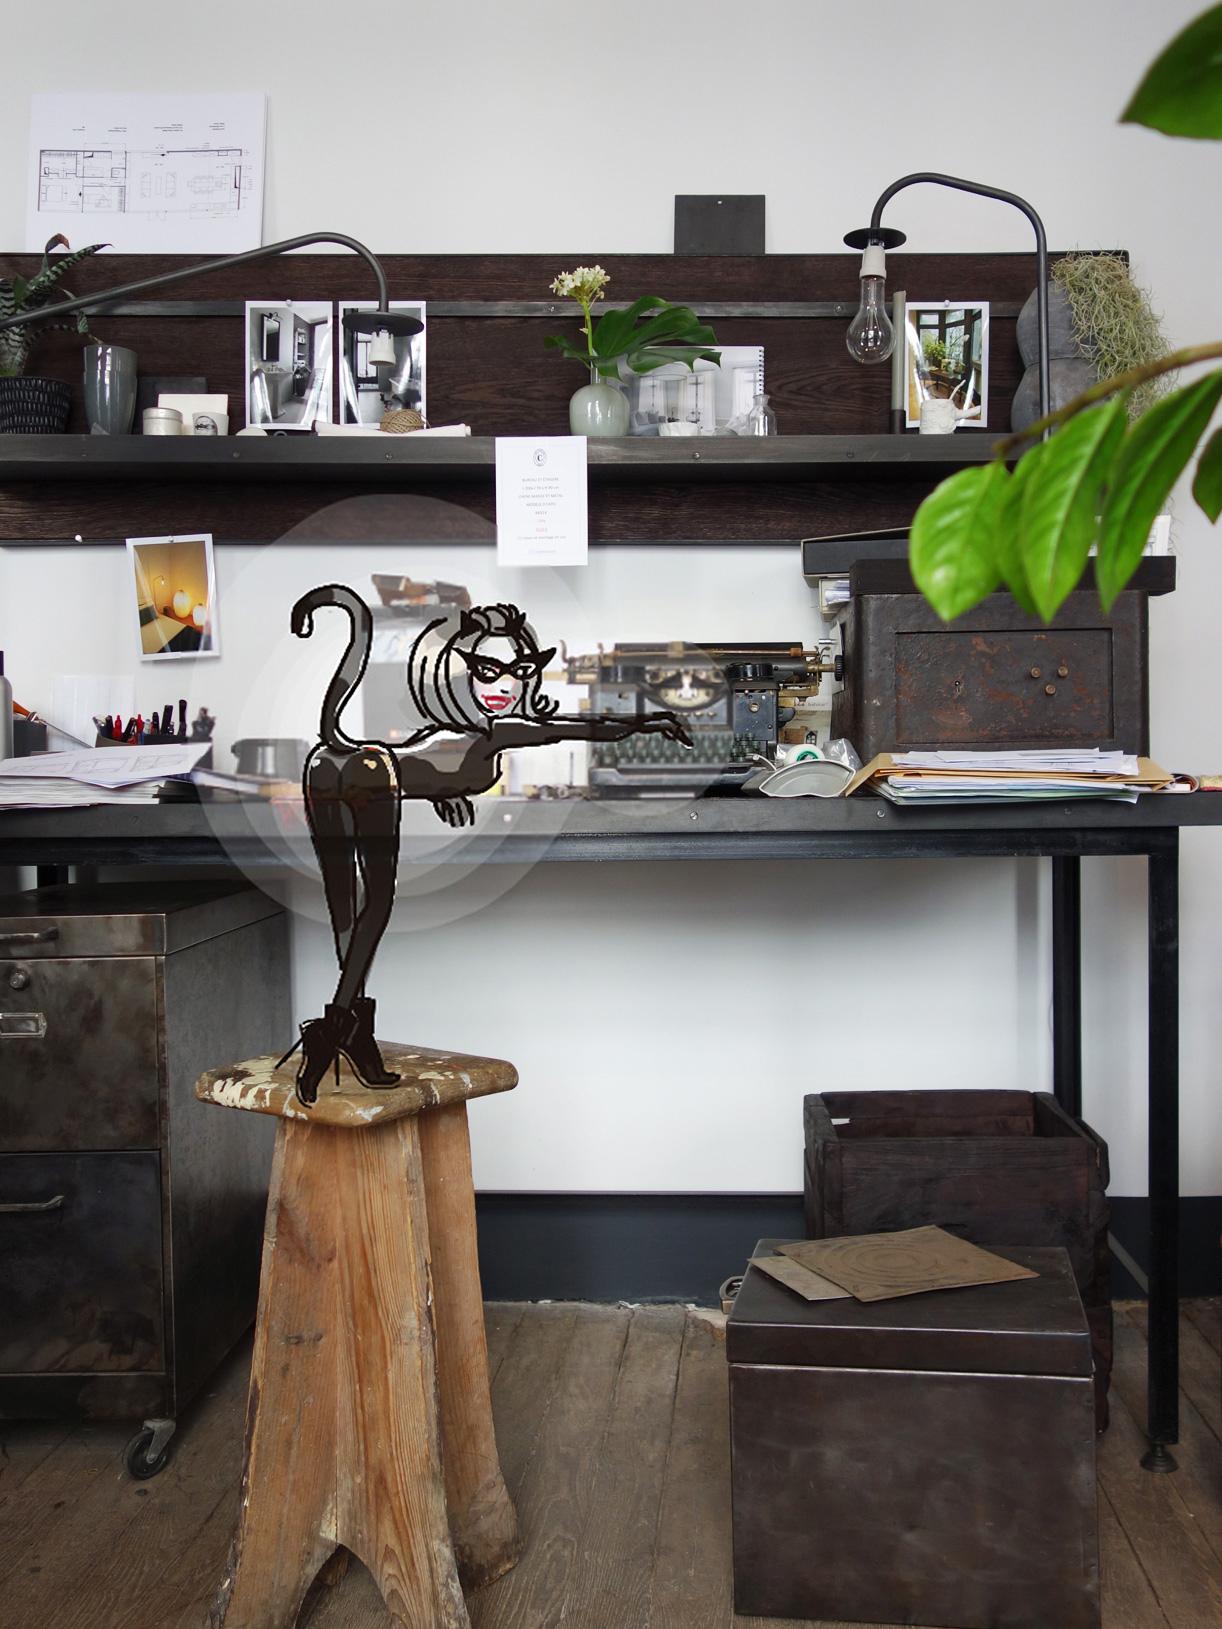 Eudoxie-CatWoman-Gaillard-machine-a-ecrire